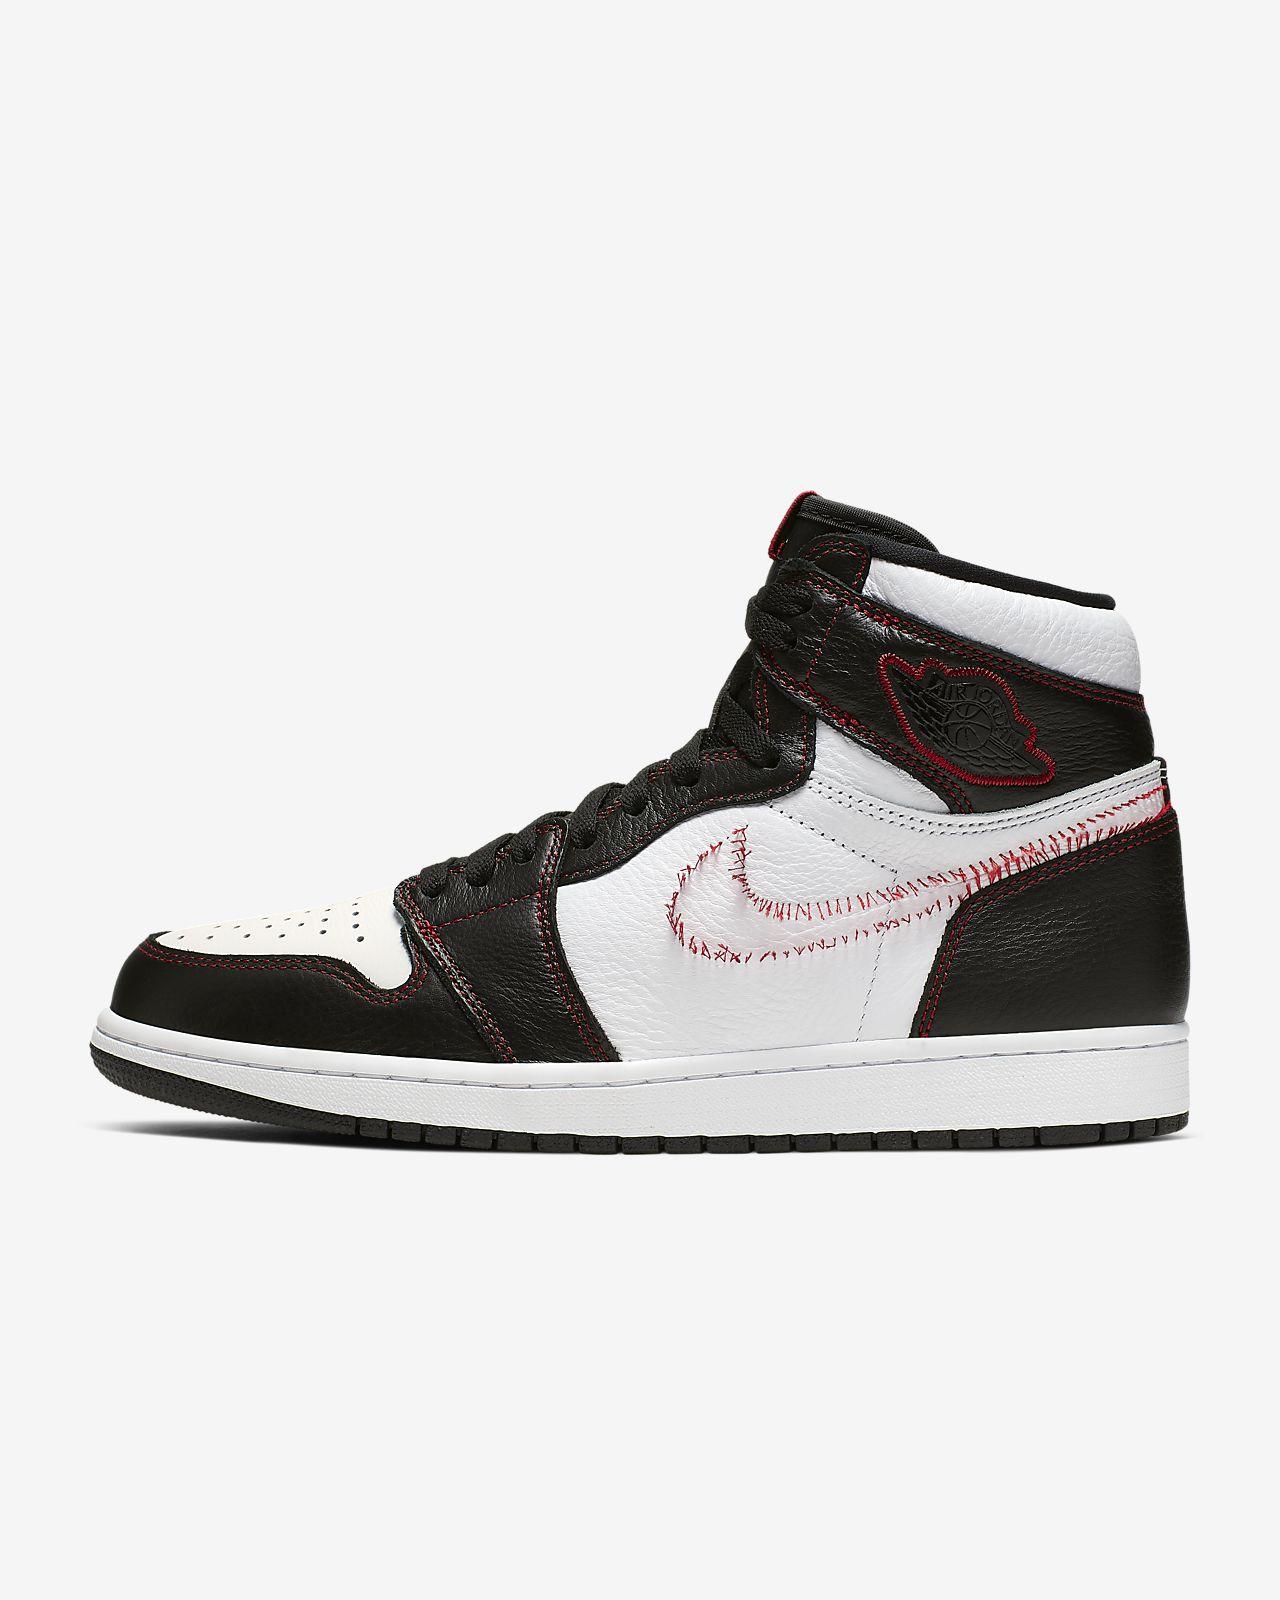 Air Jordan 1 High OG Defiant 男鞋